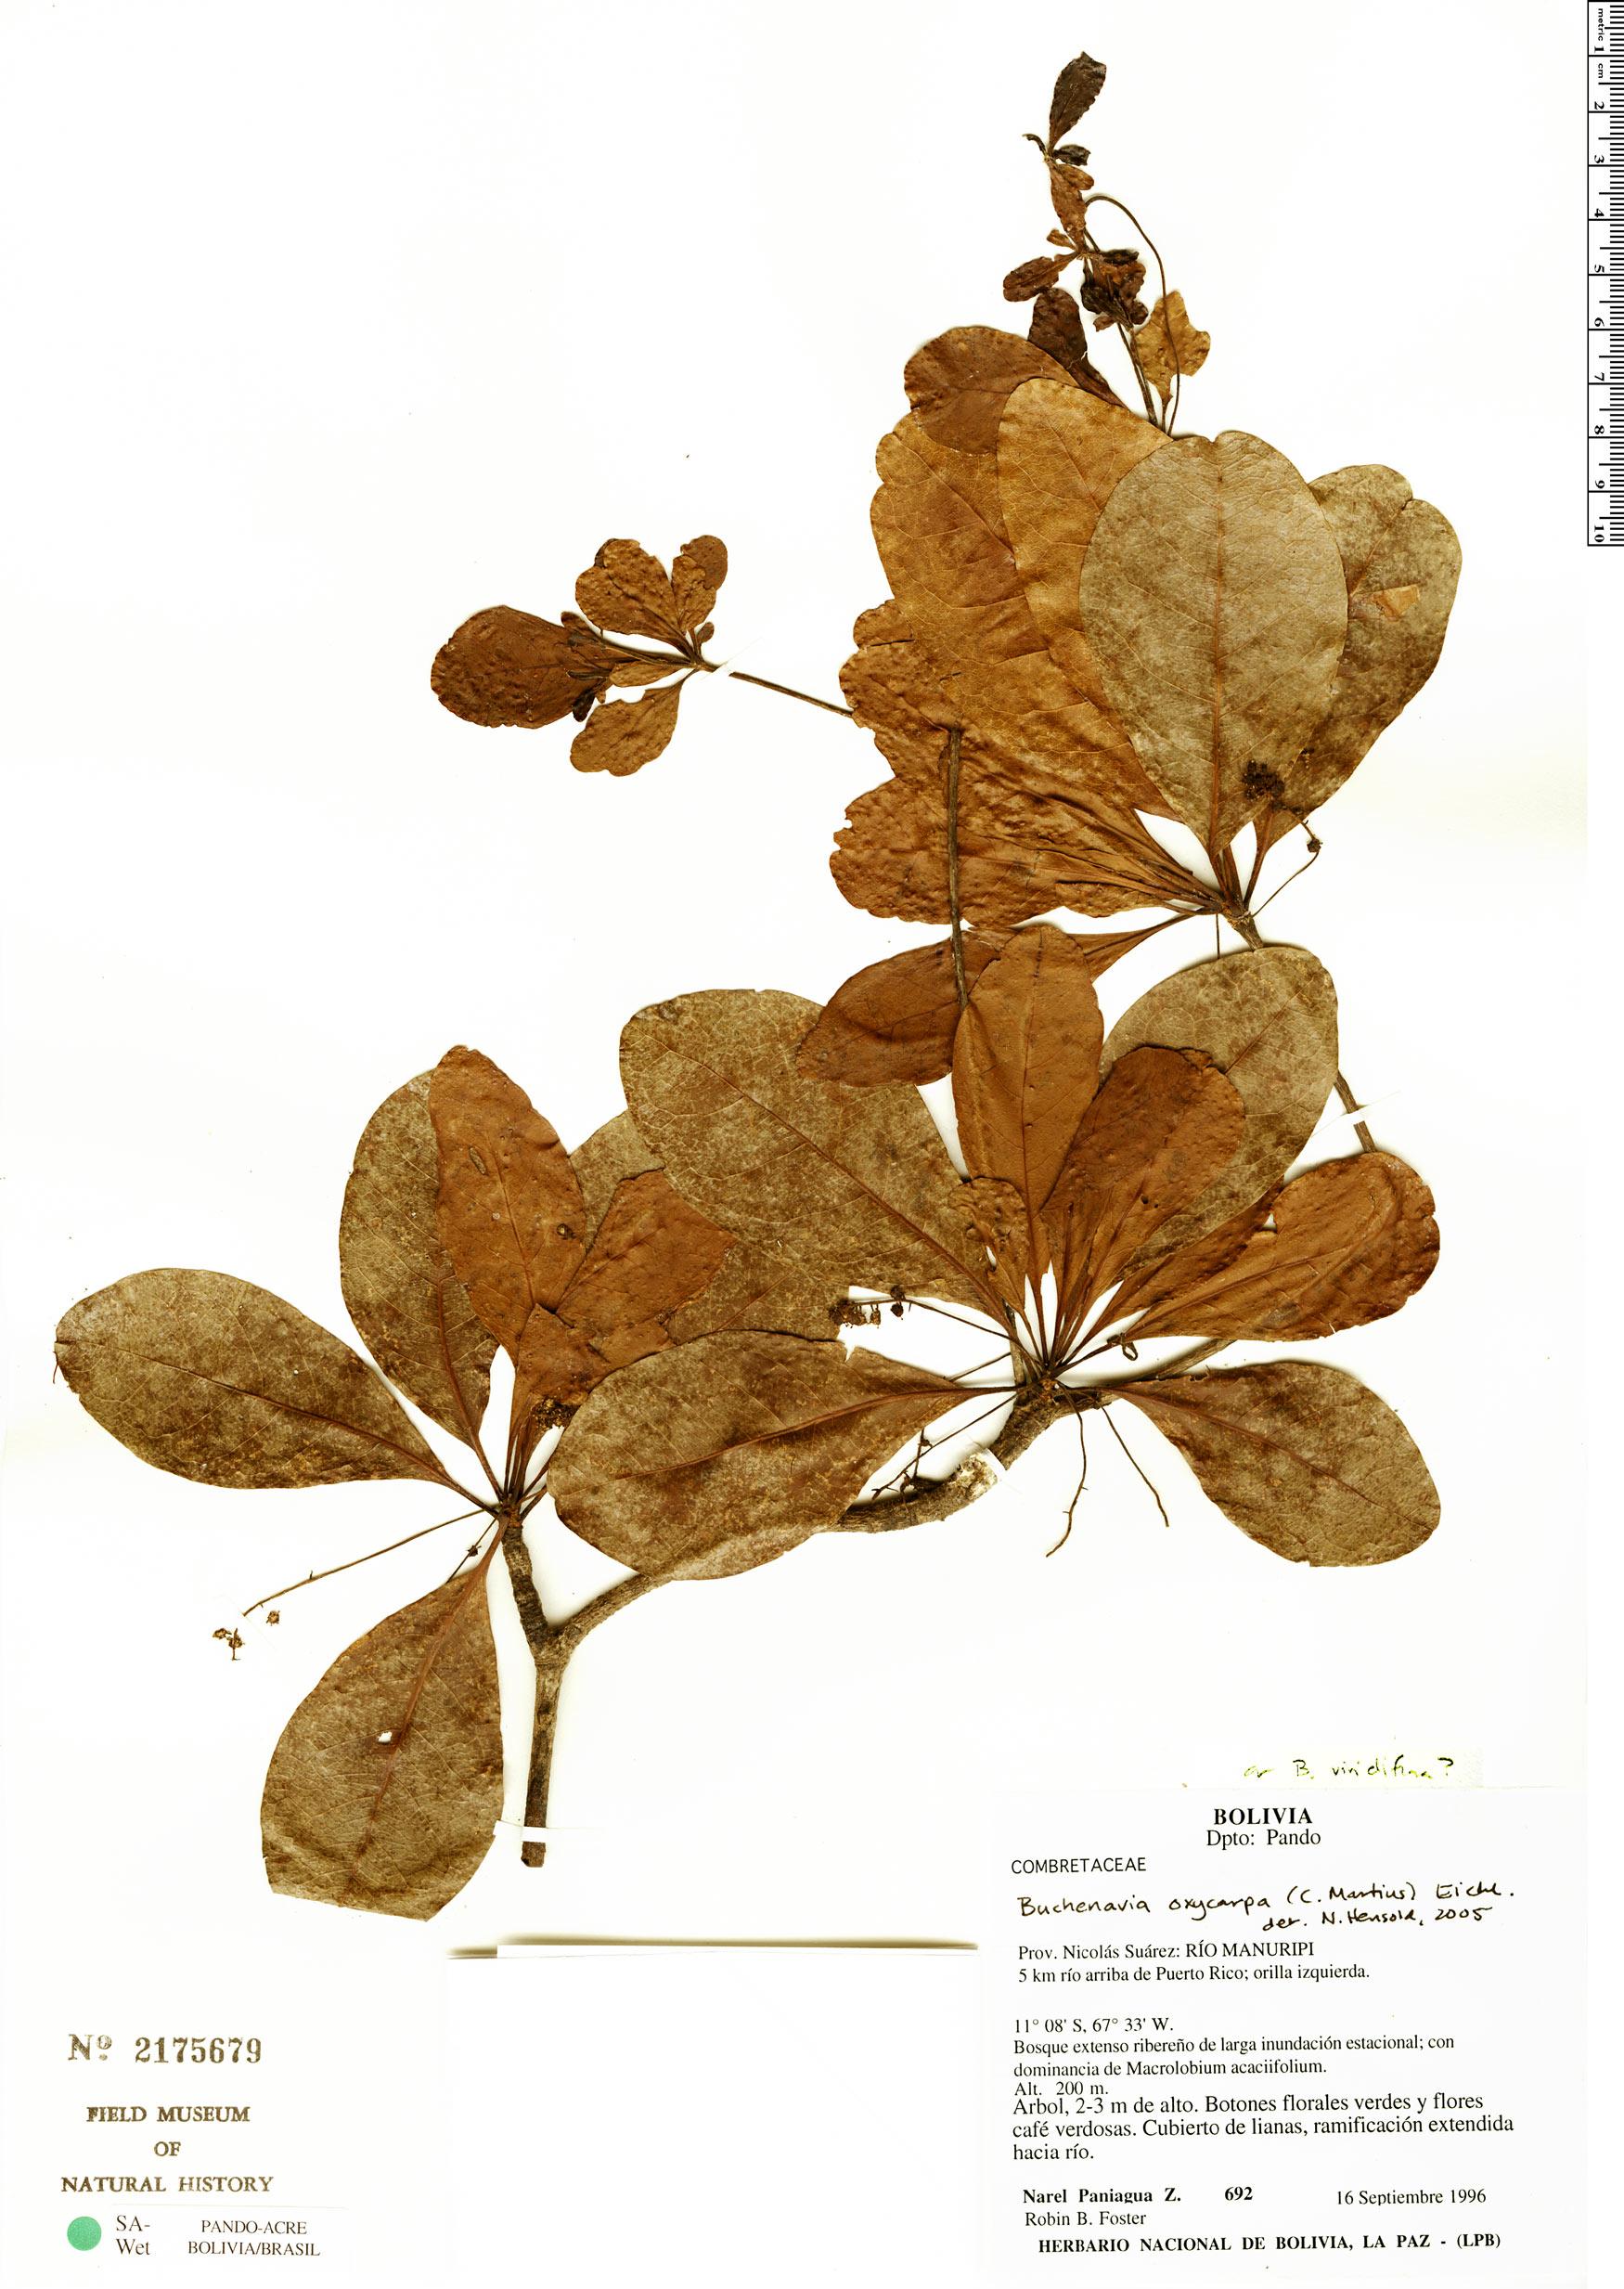 Specimen: Buchenavia oxycarpa